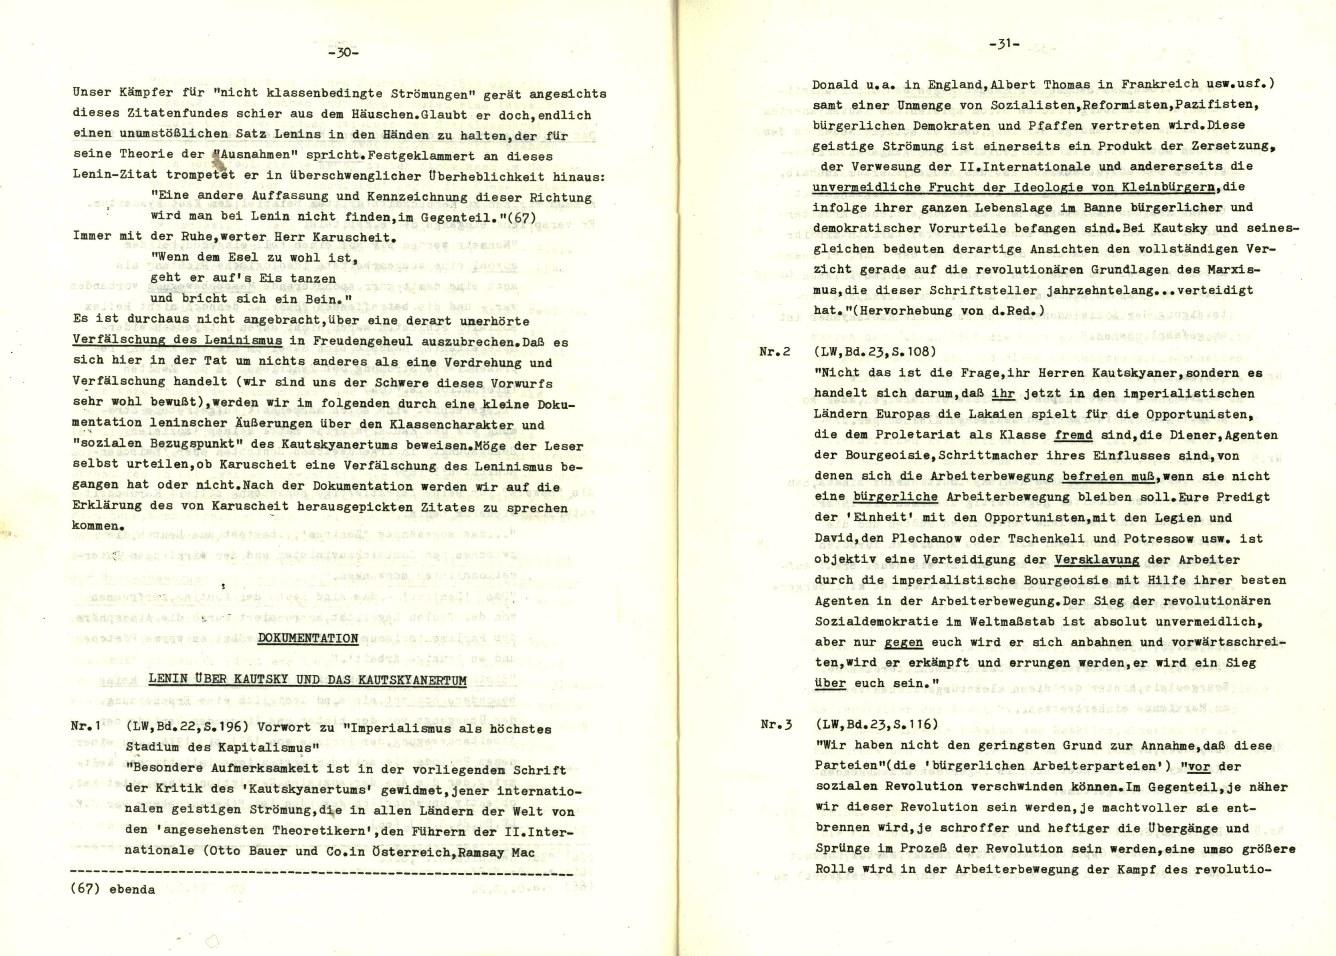 Muenchen_Kampf_dem_Revisionismus_1979_09_16